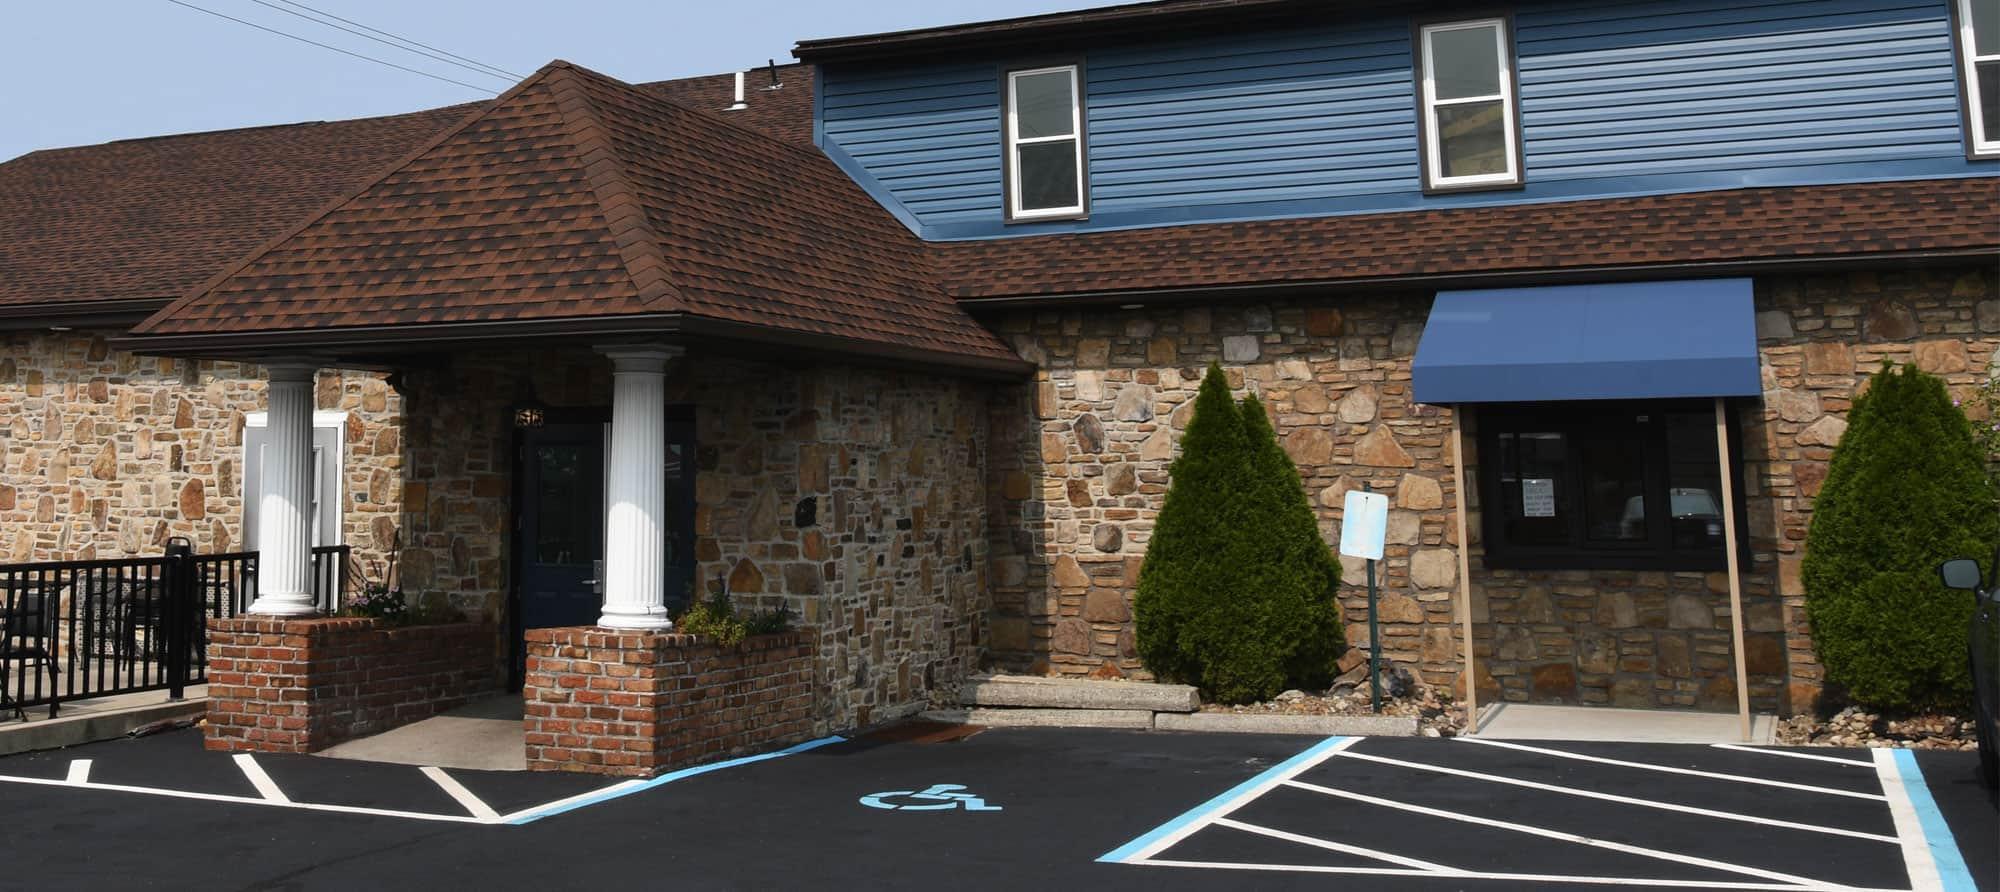 Entrance of NyKo's restaurant